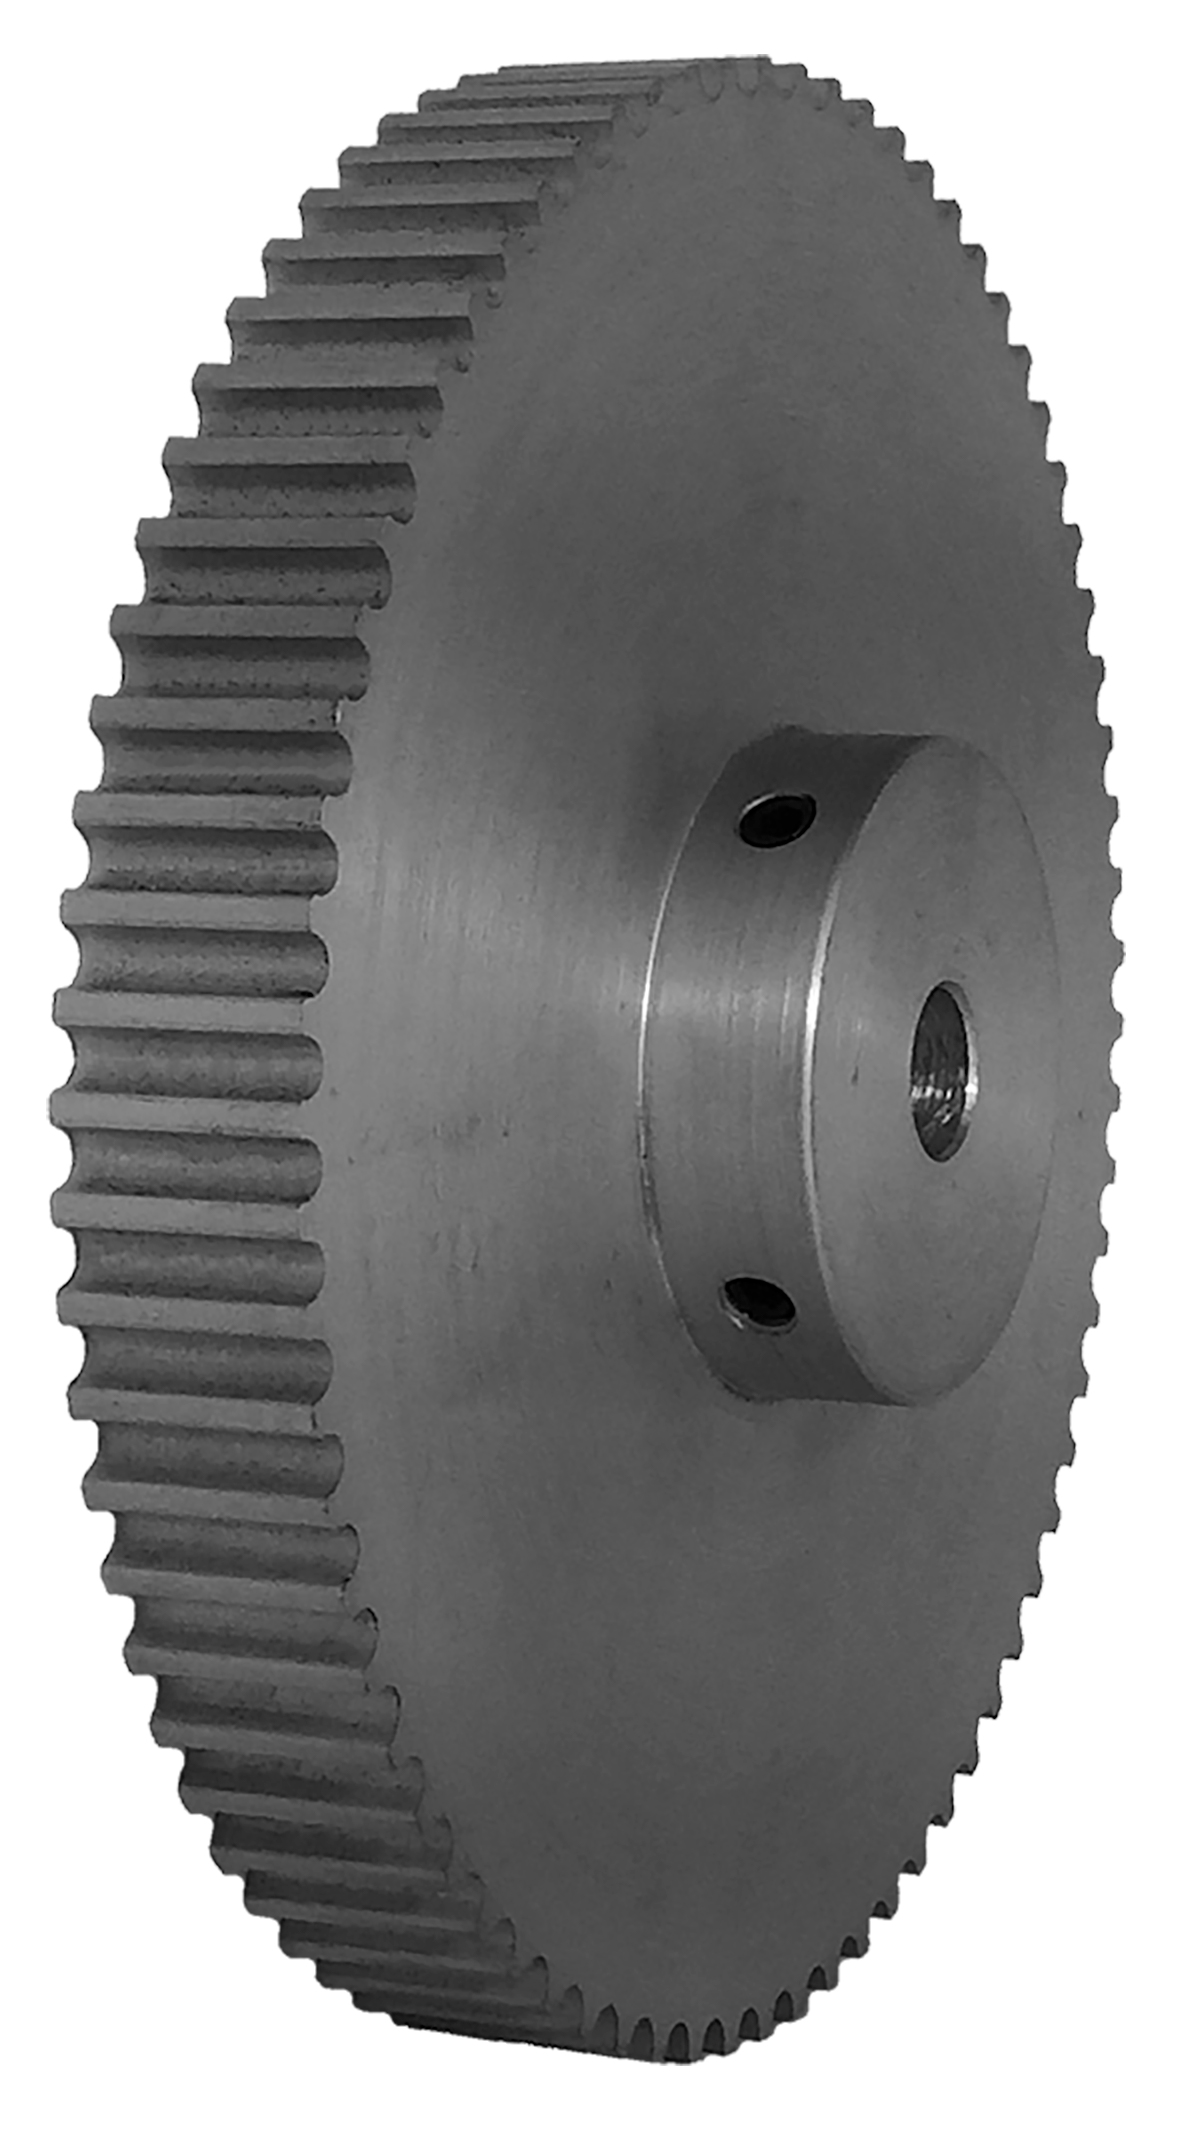 72-5M09-6A5 - Aluminum Powerhouse®HTD® Pulleys